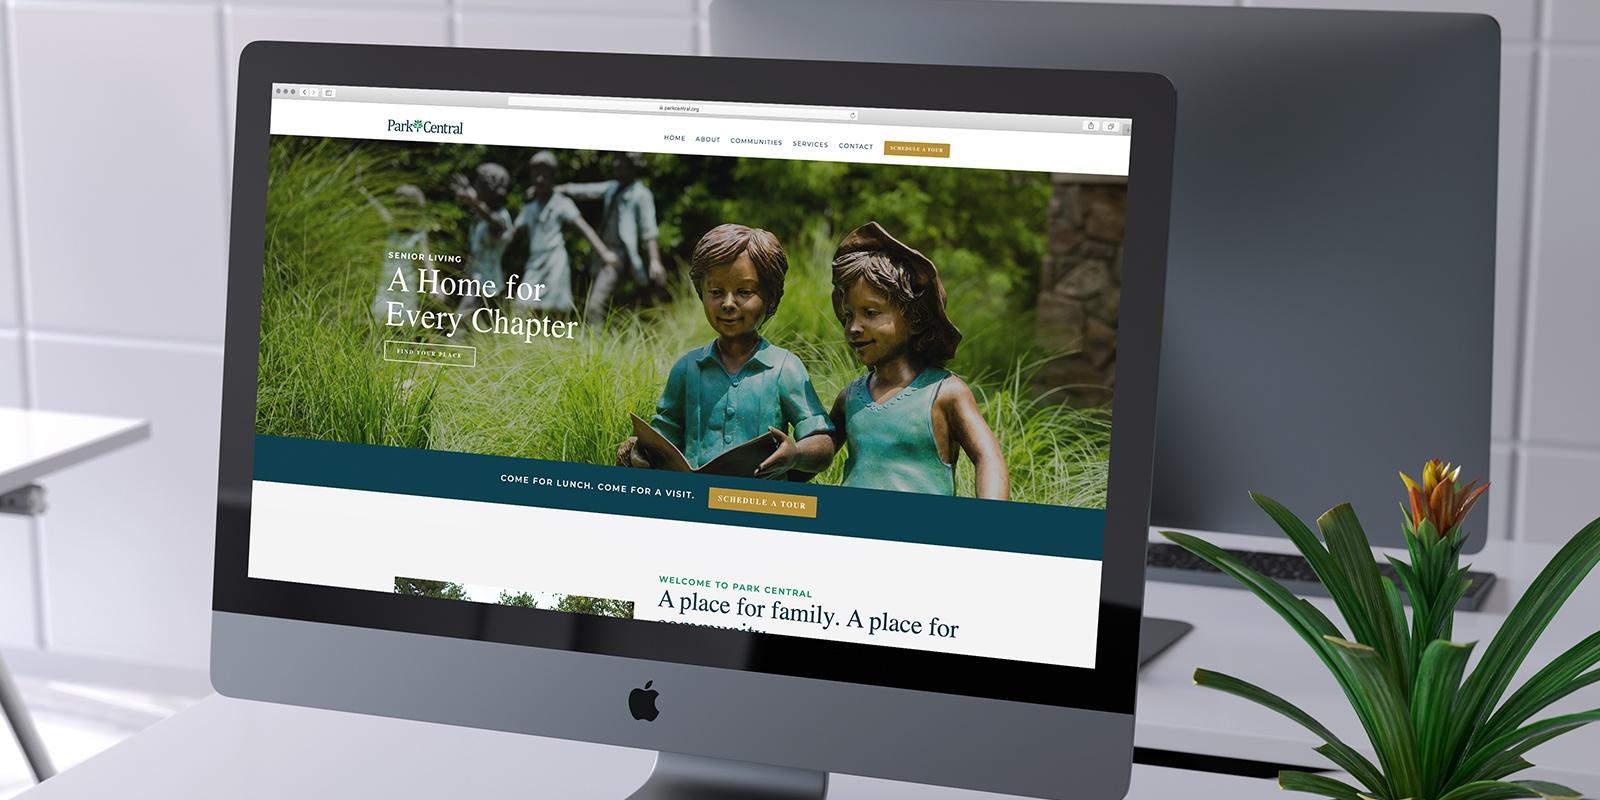 Park Central Senior Living community website design